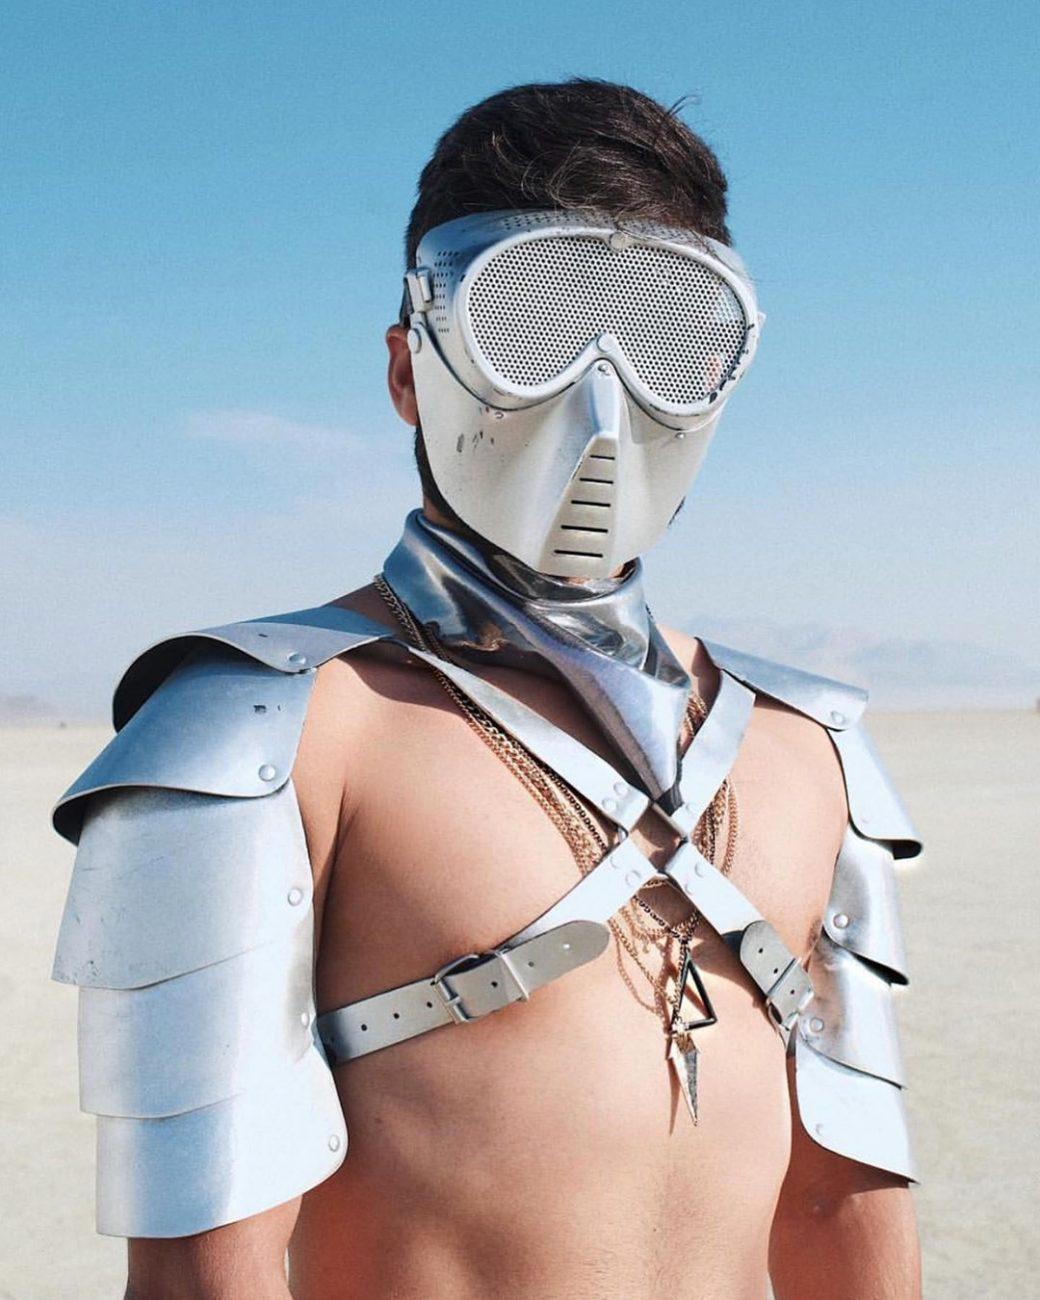 mens-robot-outfit-burning-man-2019